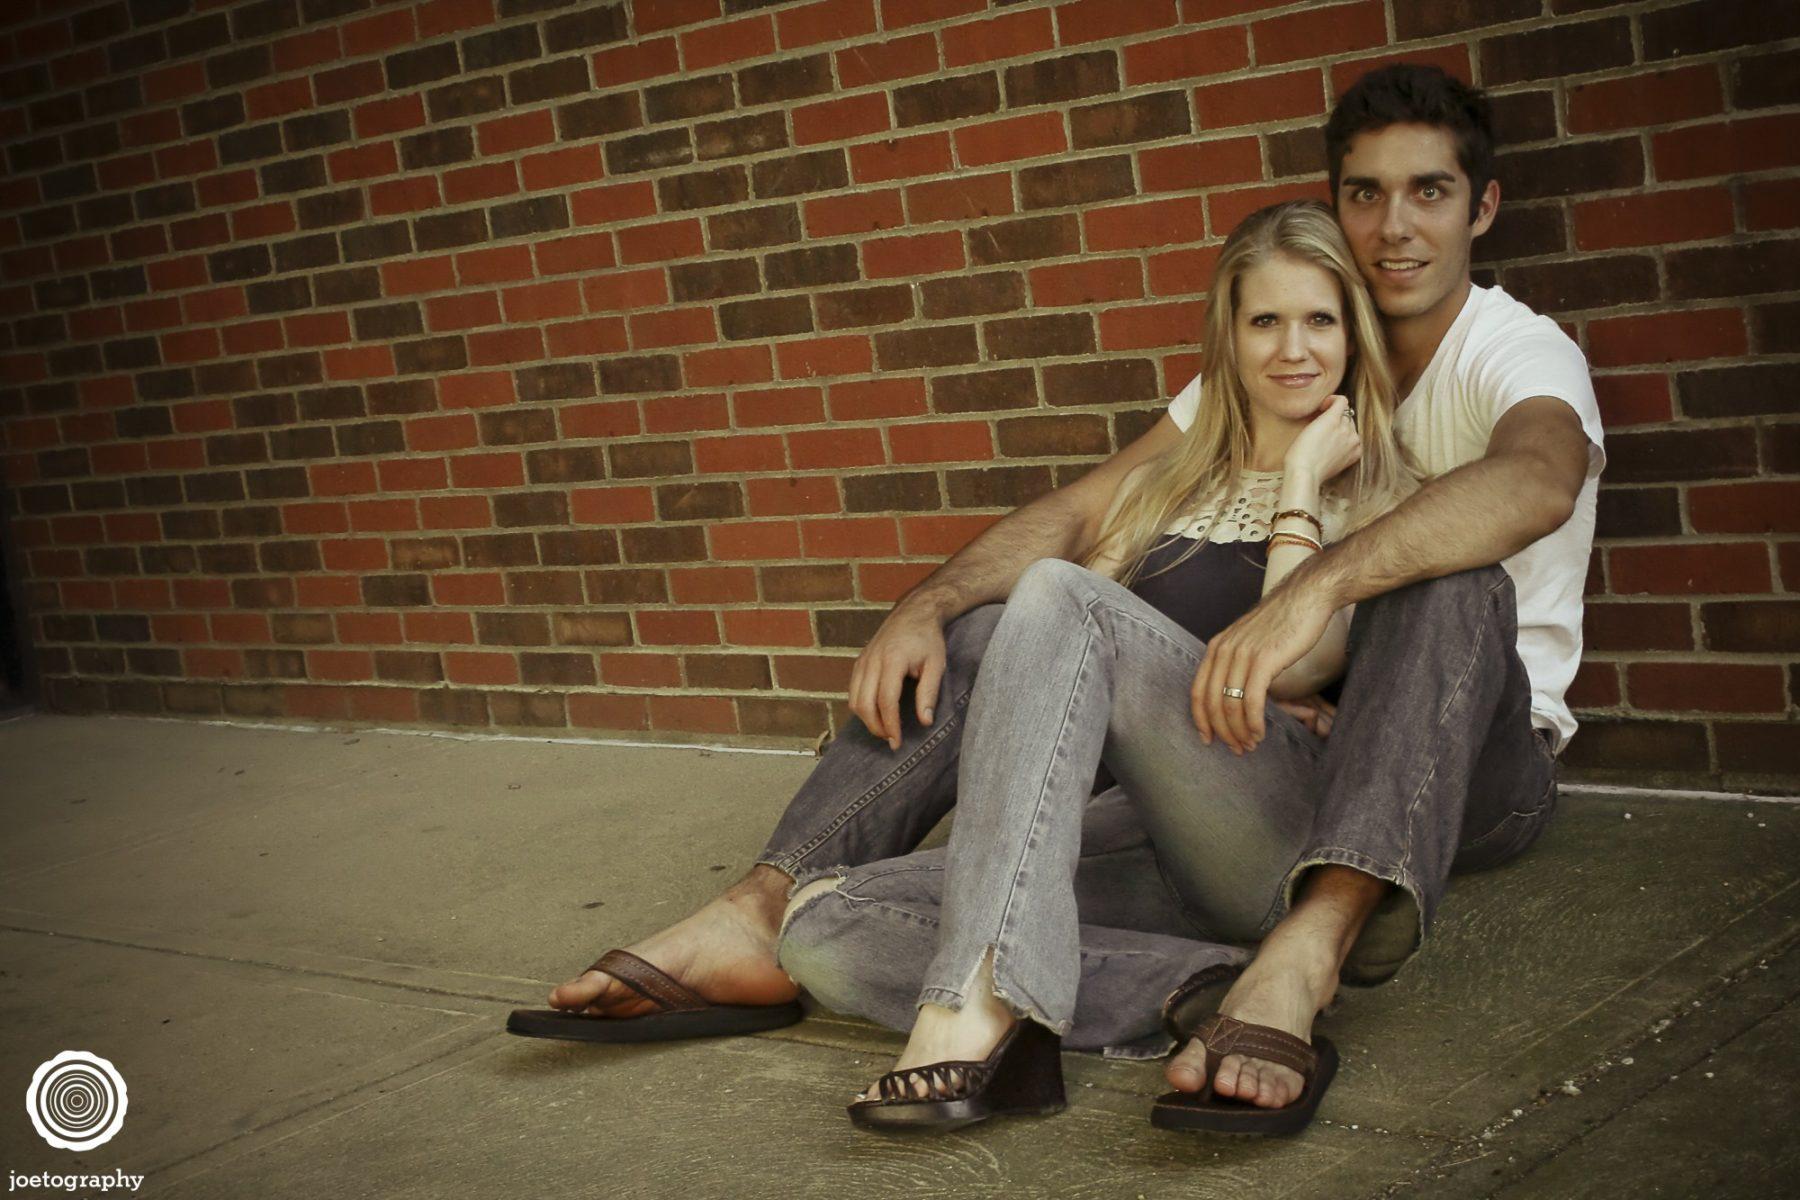 Kyle-Ashley-Family-Photos-Indianapolis-Canal-108